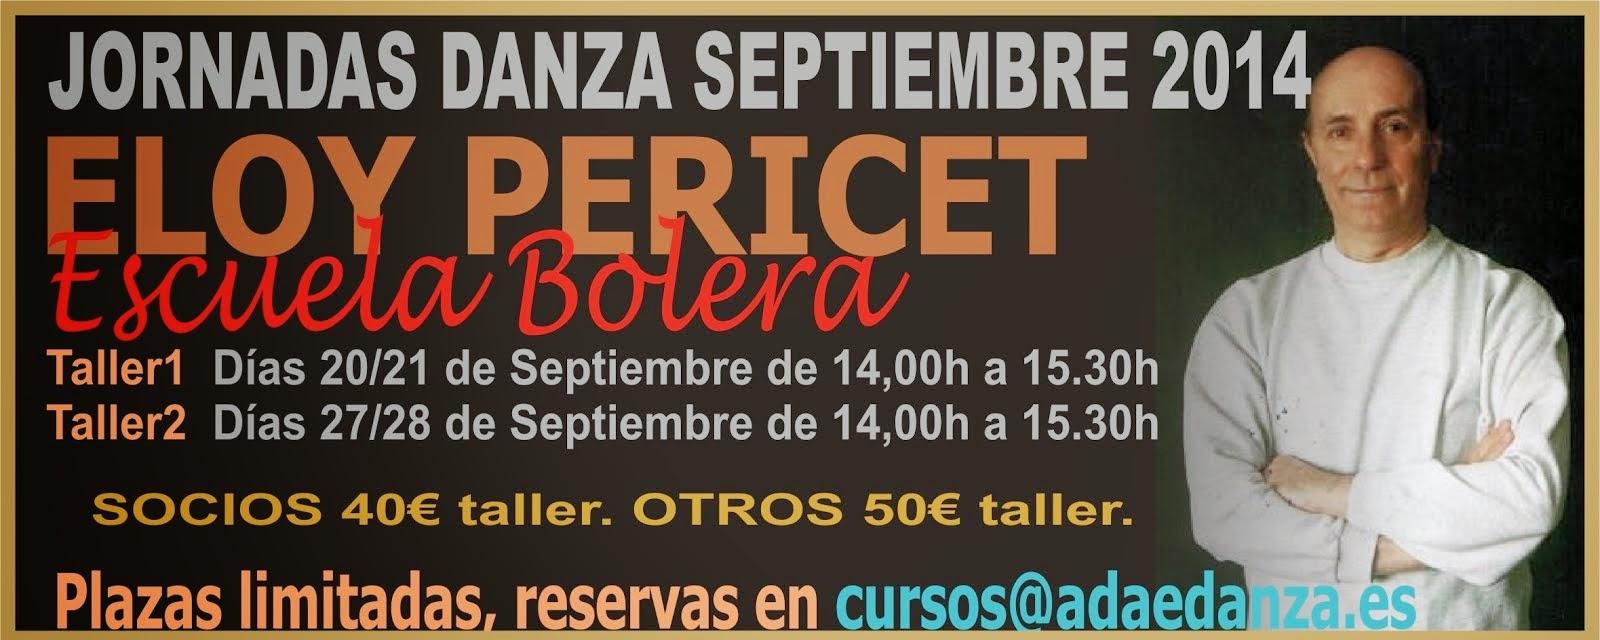 ELOY PERICET - TALLER ESCUELA BOLERA